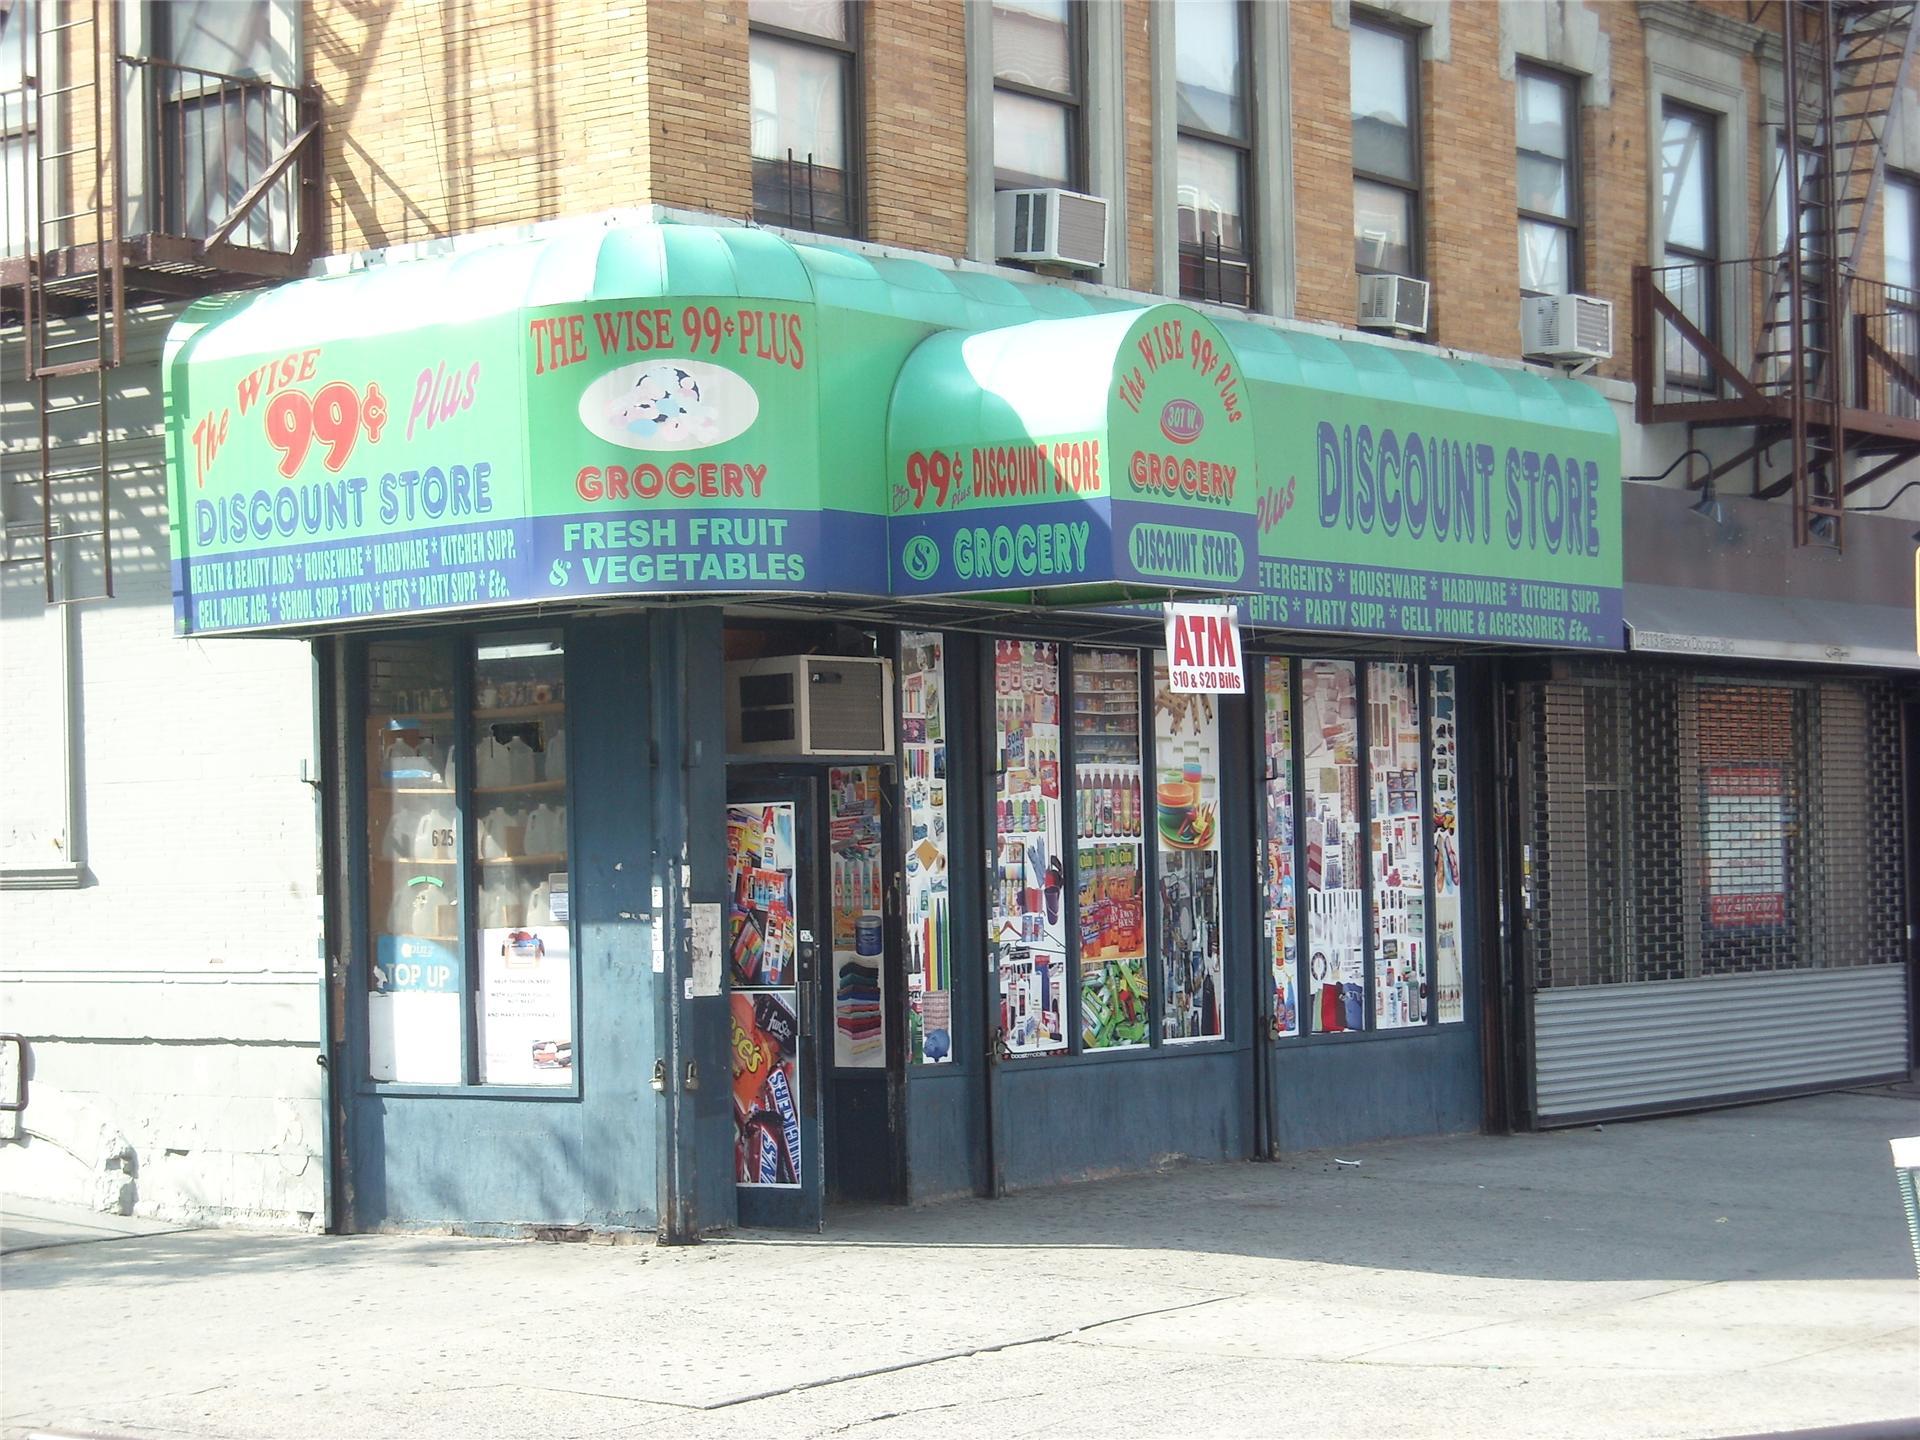 2111 Frederick Douglass Boulevard, RETAIL - Harlem, New York